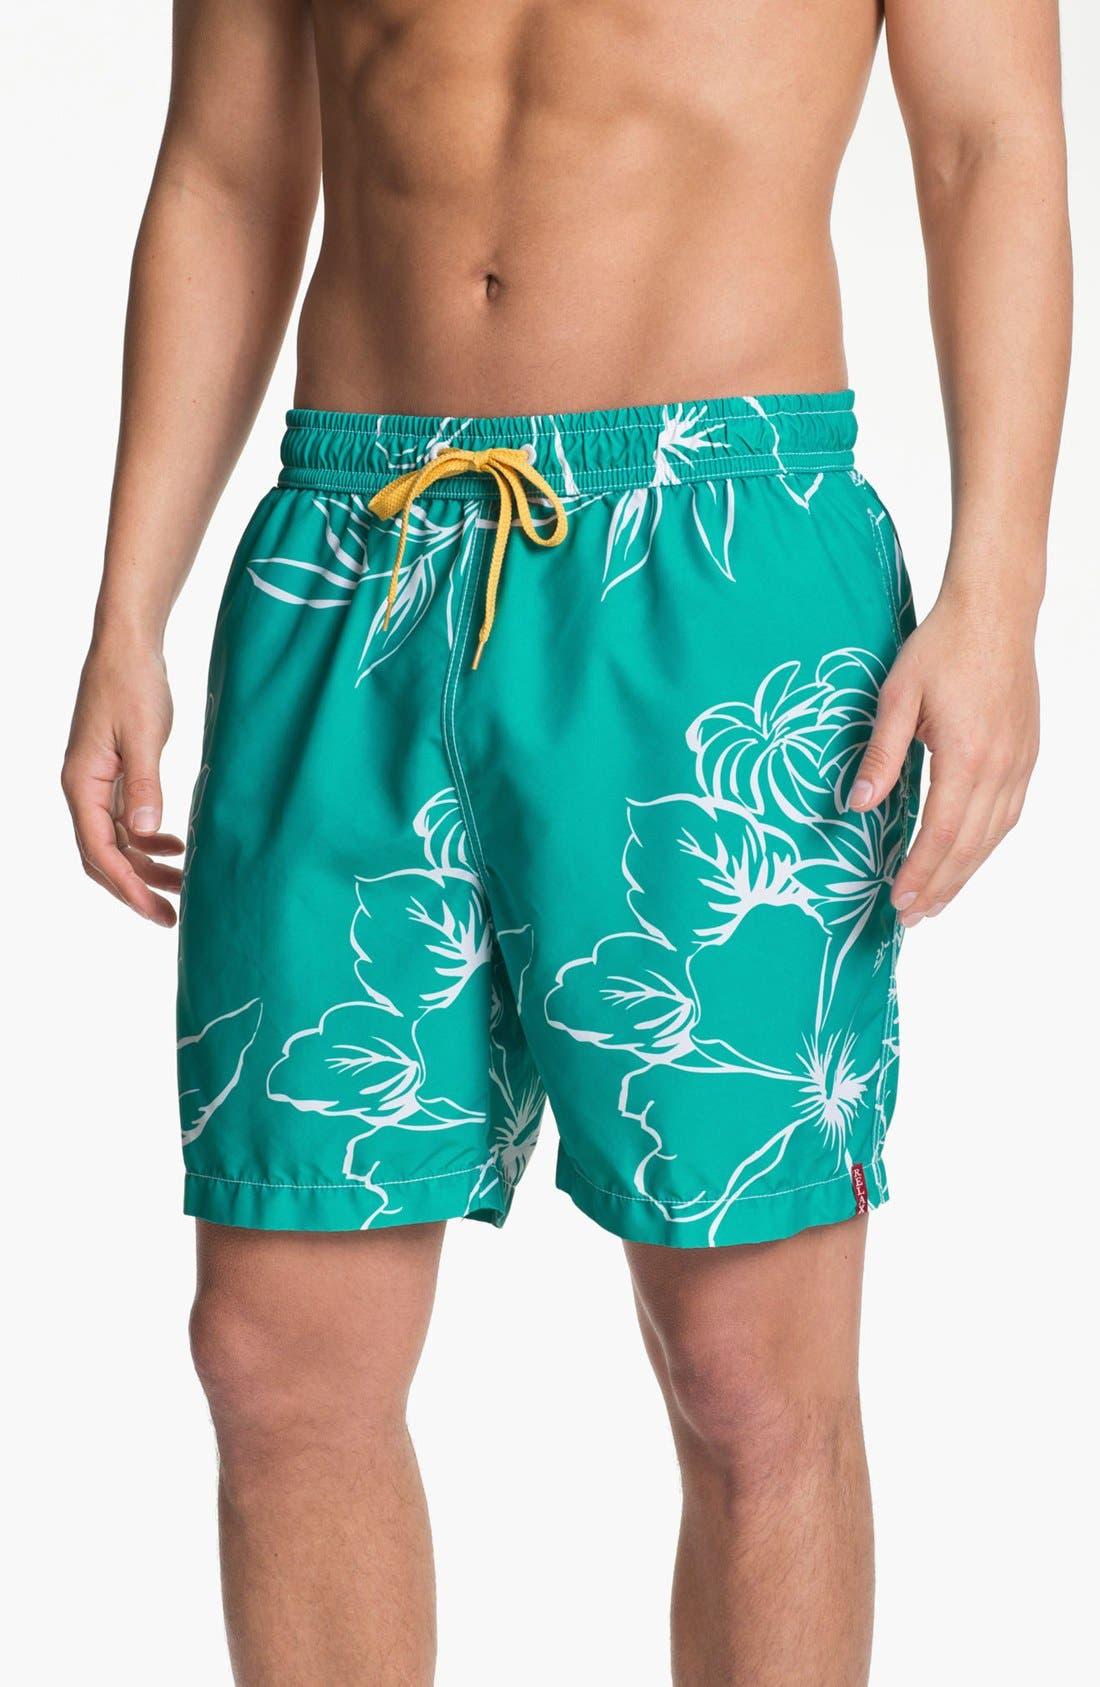 Main Image - Tommy Bahama 'Bloom Over Miami' Swim Trunks